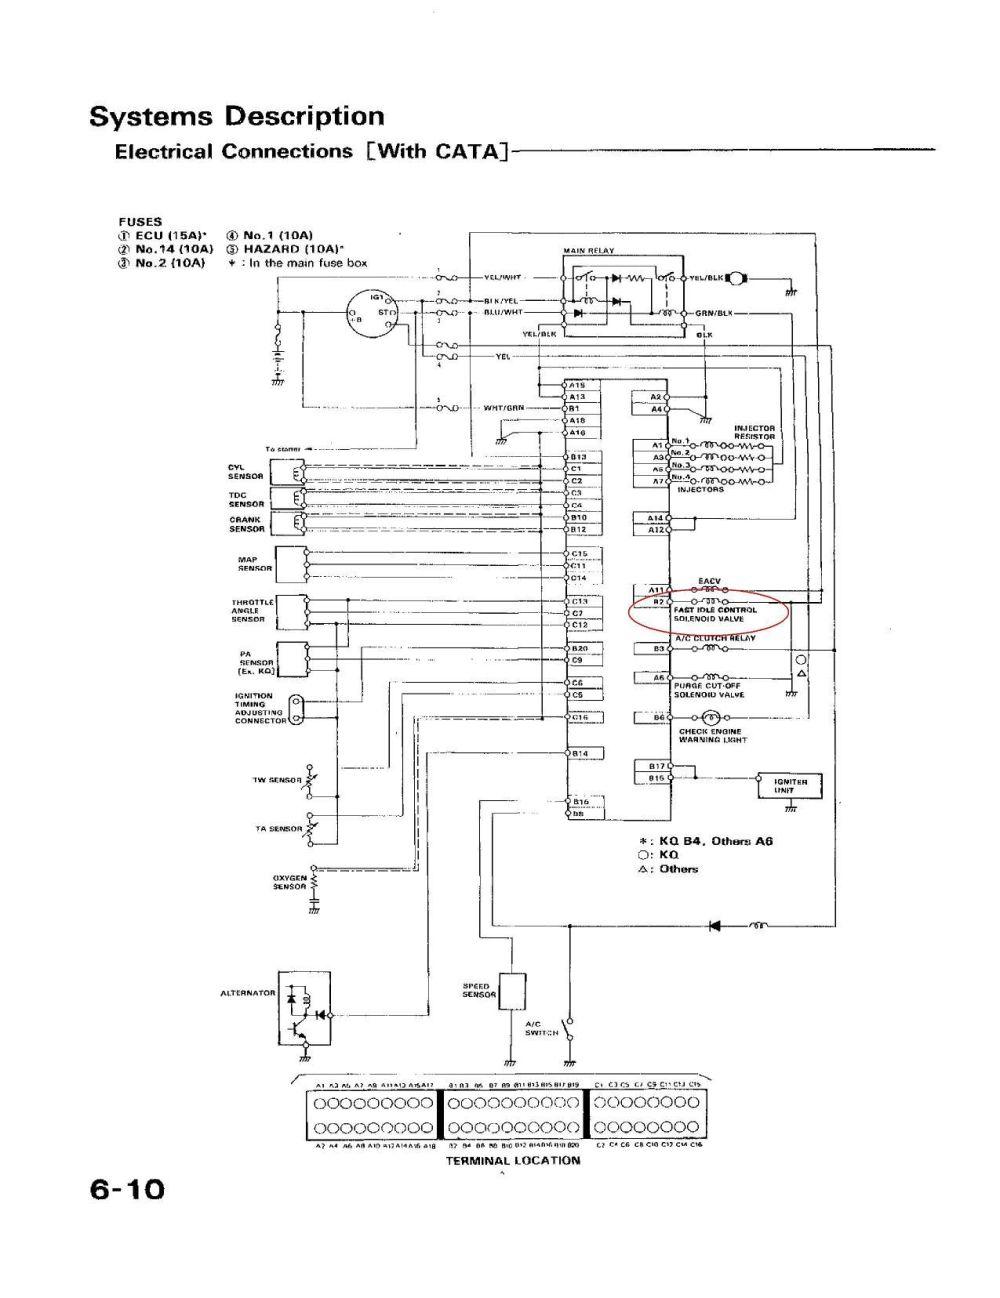 medium resolution of honda crx radio wiring diagram wiring diagram 88 honda crx radio wiring diagram and hernes